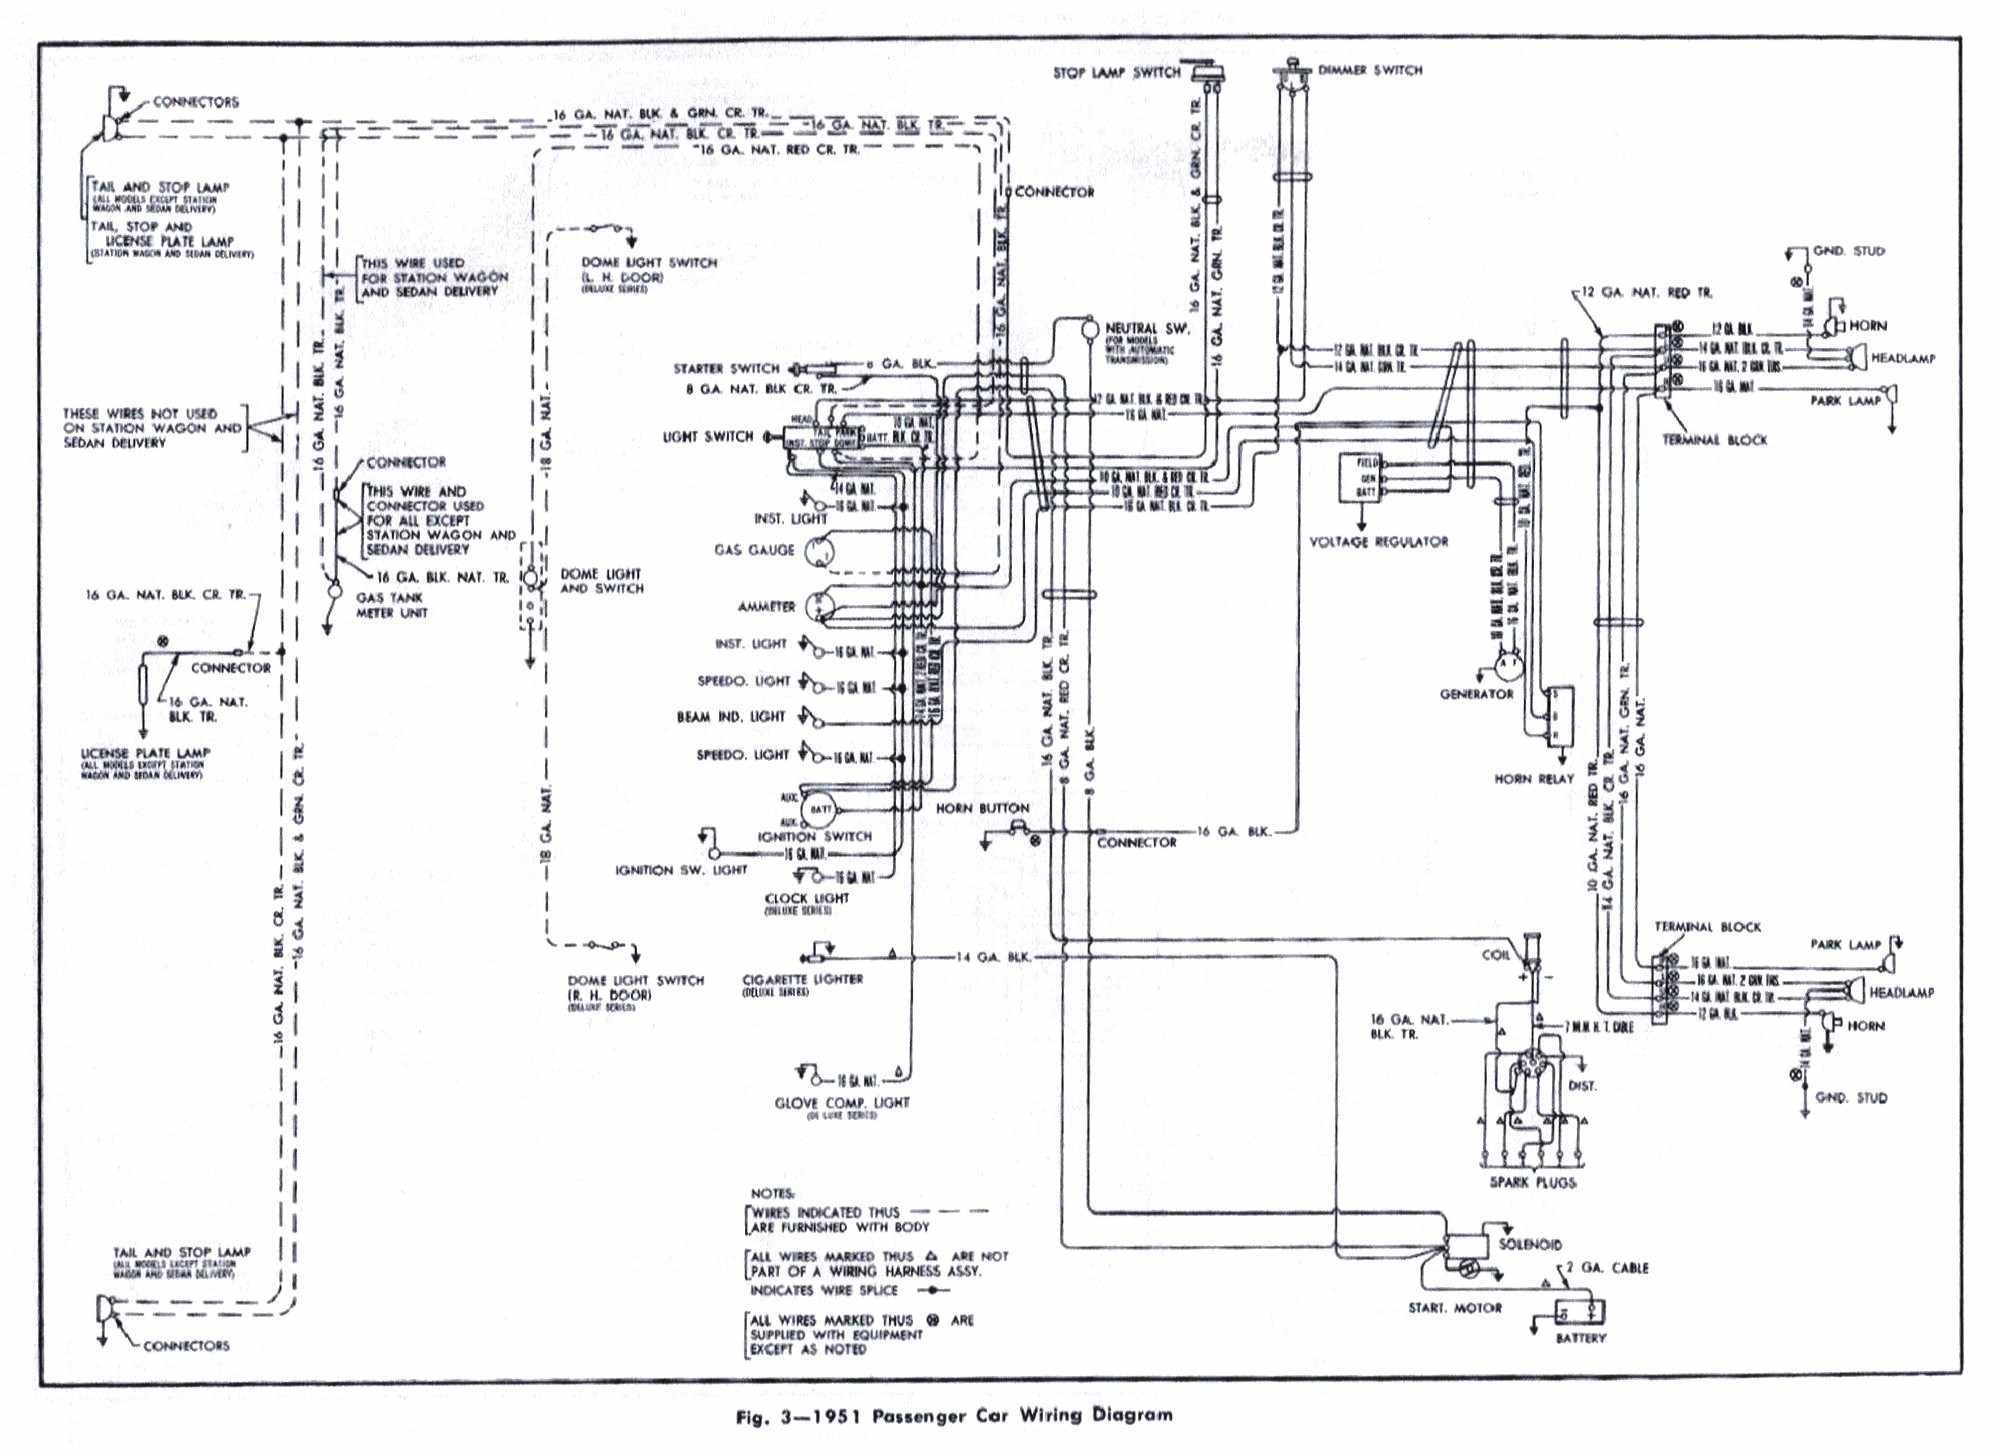 CHEVROLET - Car PDF Manual, Wiring Diagram & Fault Codes DTC | Chevrolet Wiring Diagrams Free Download |  | CAR PDF Manuals & Fault Codes DTC